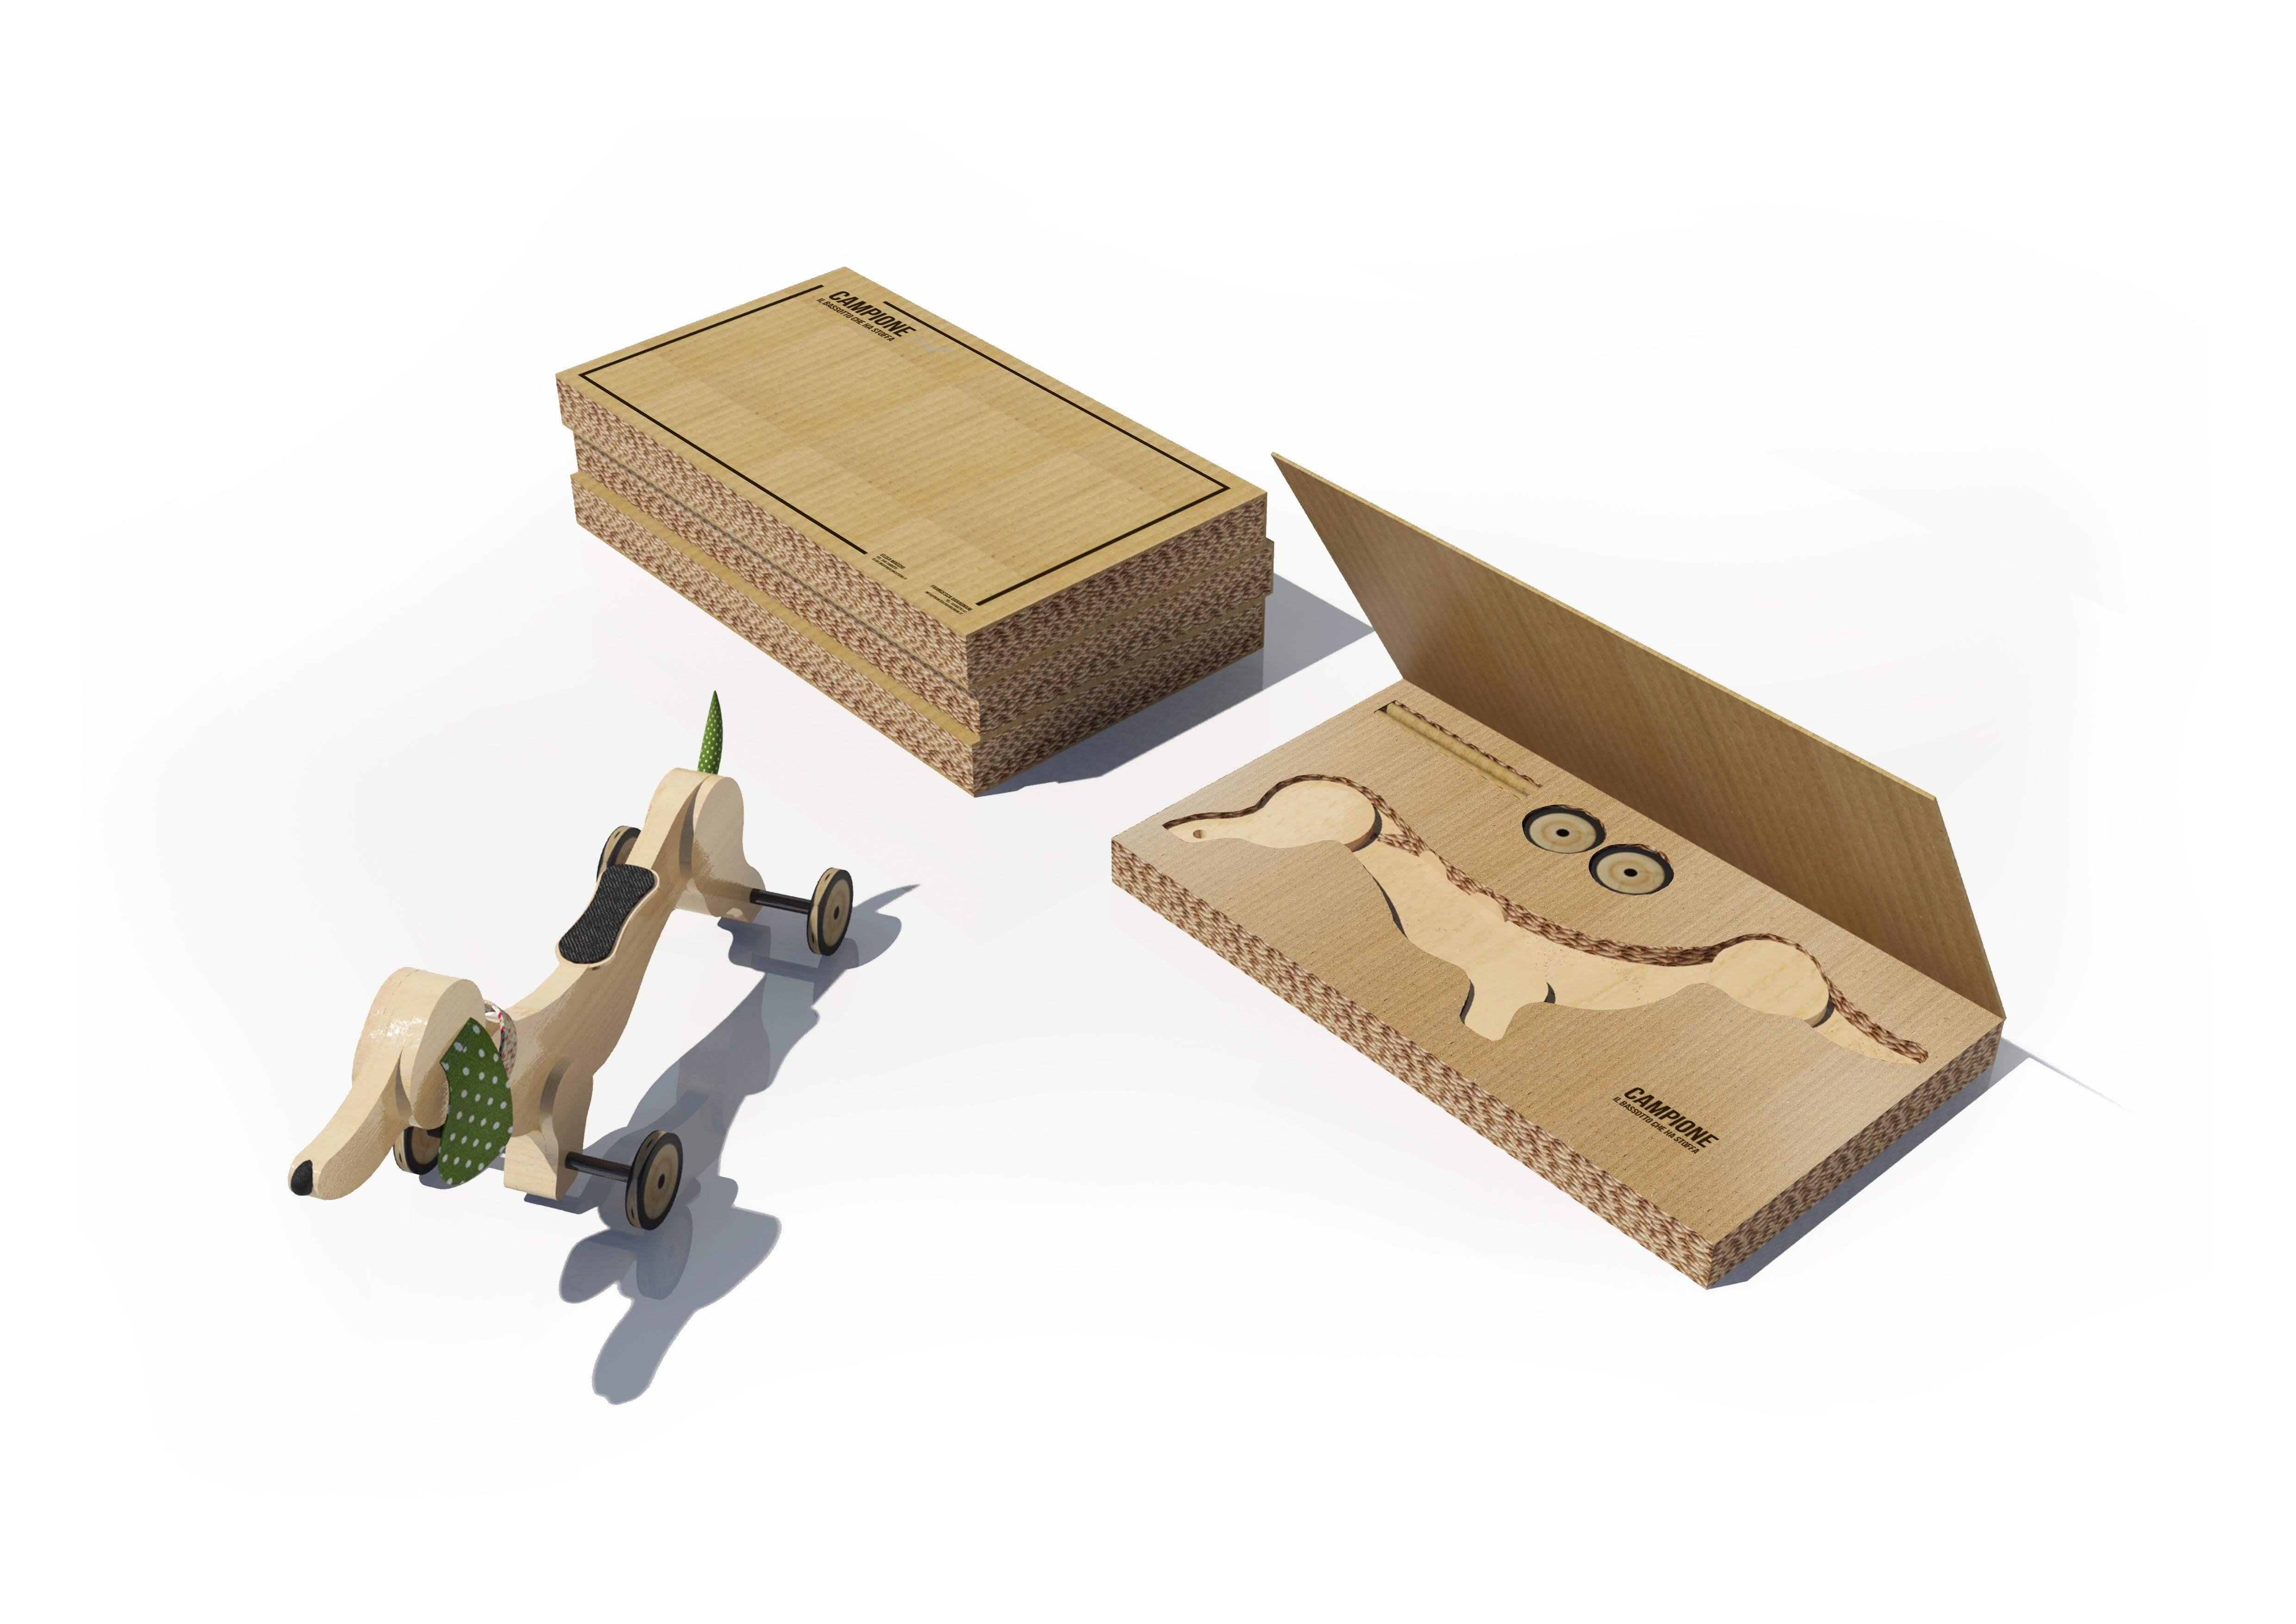 elisa_macchi_campione_giocattolo_packaging